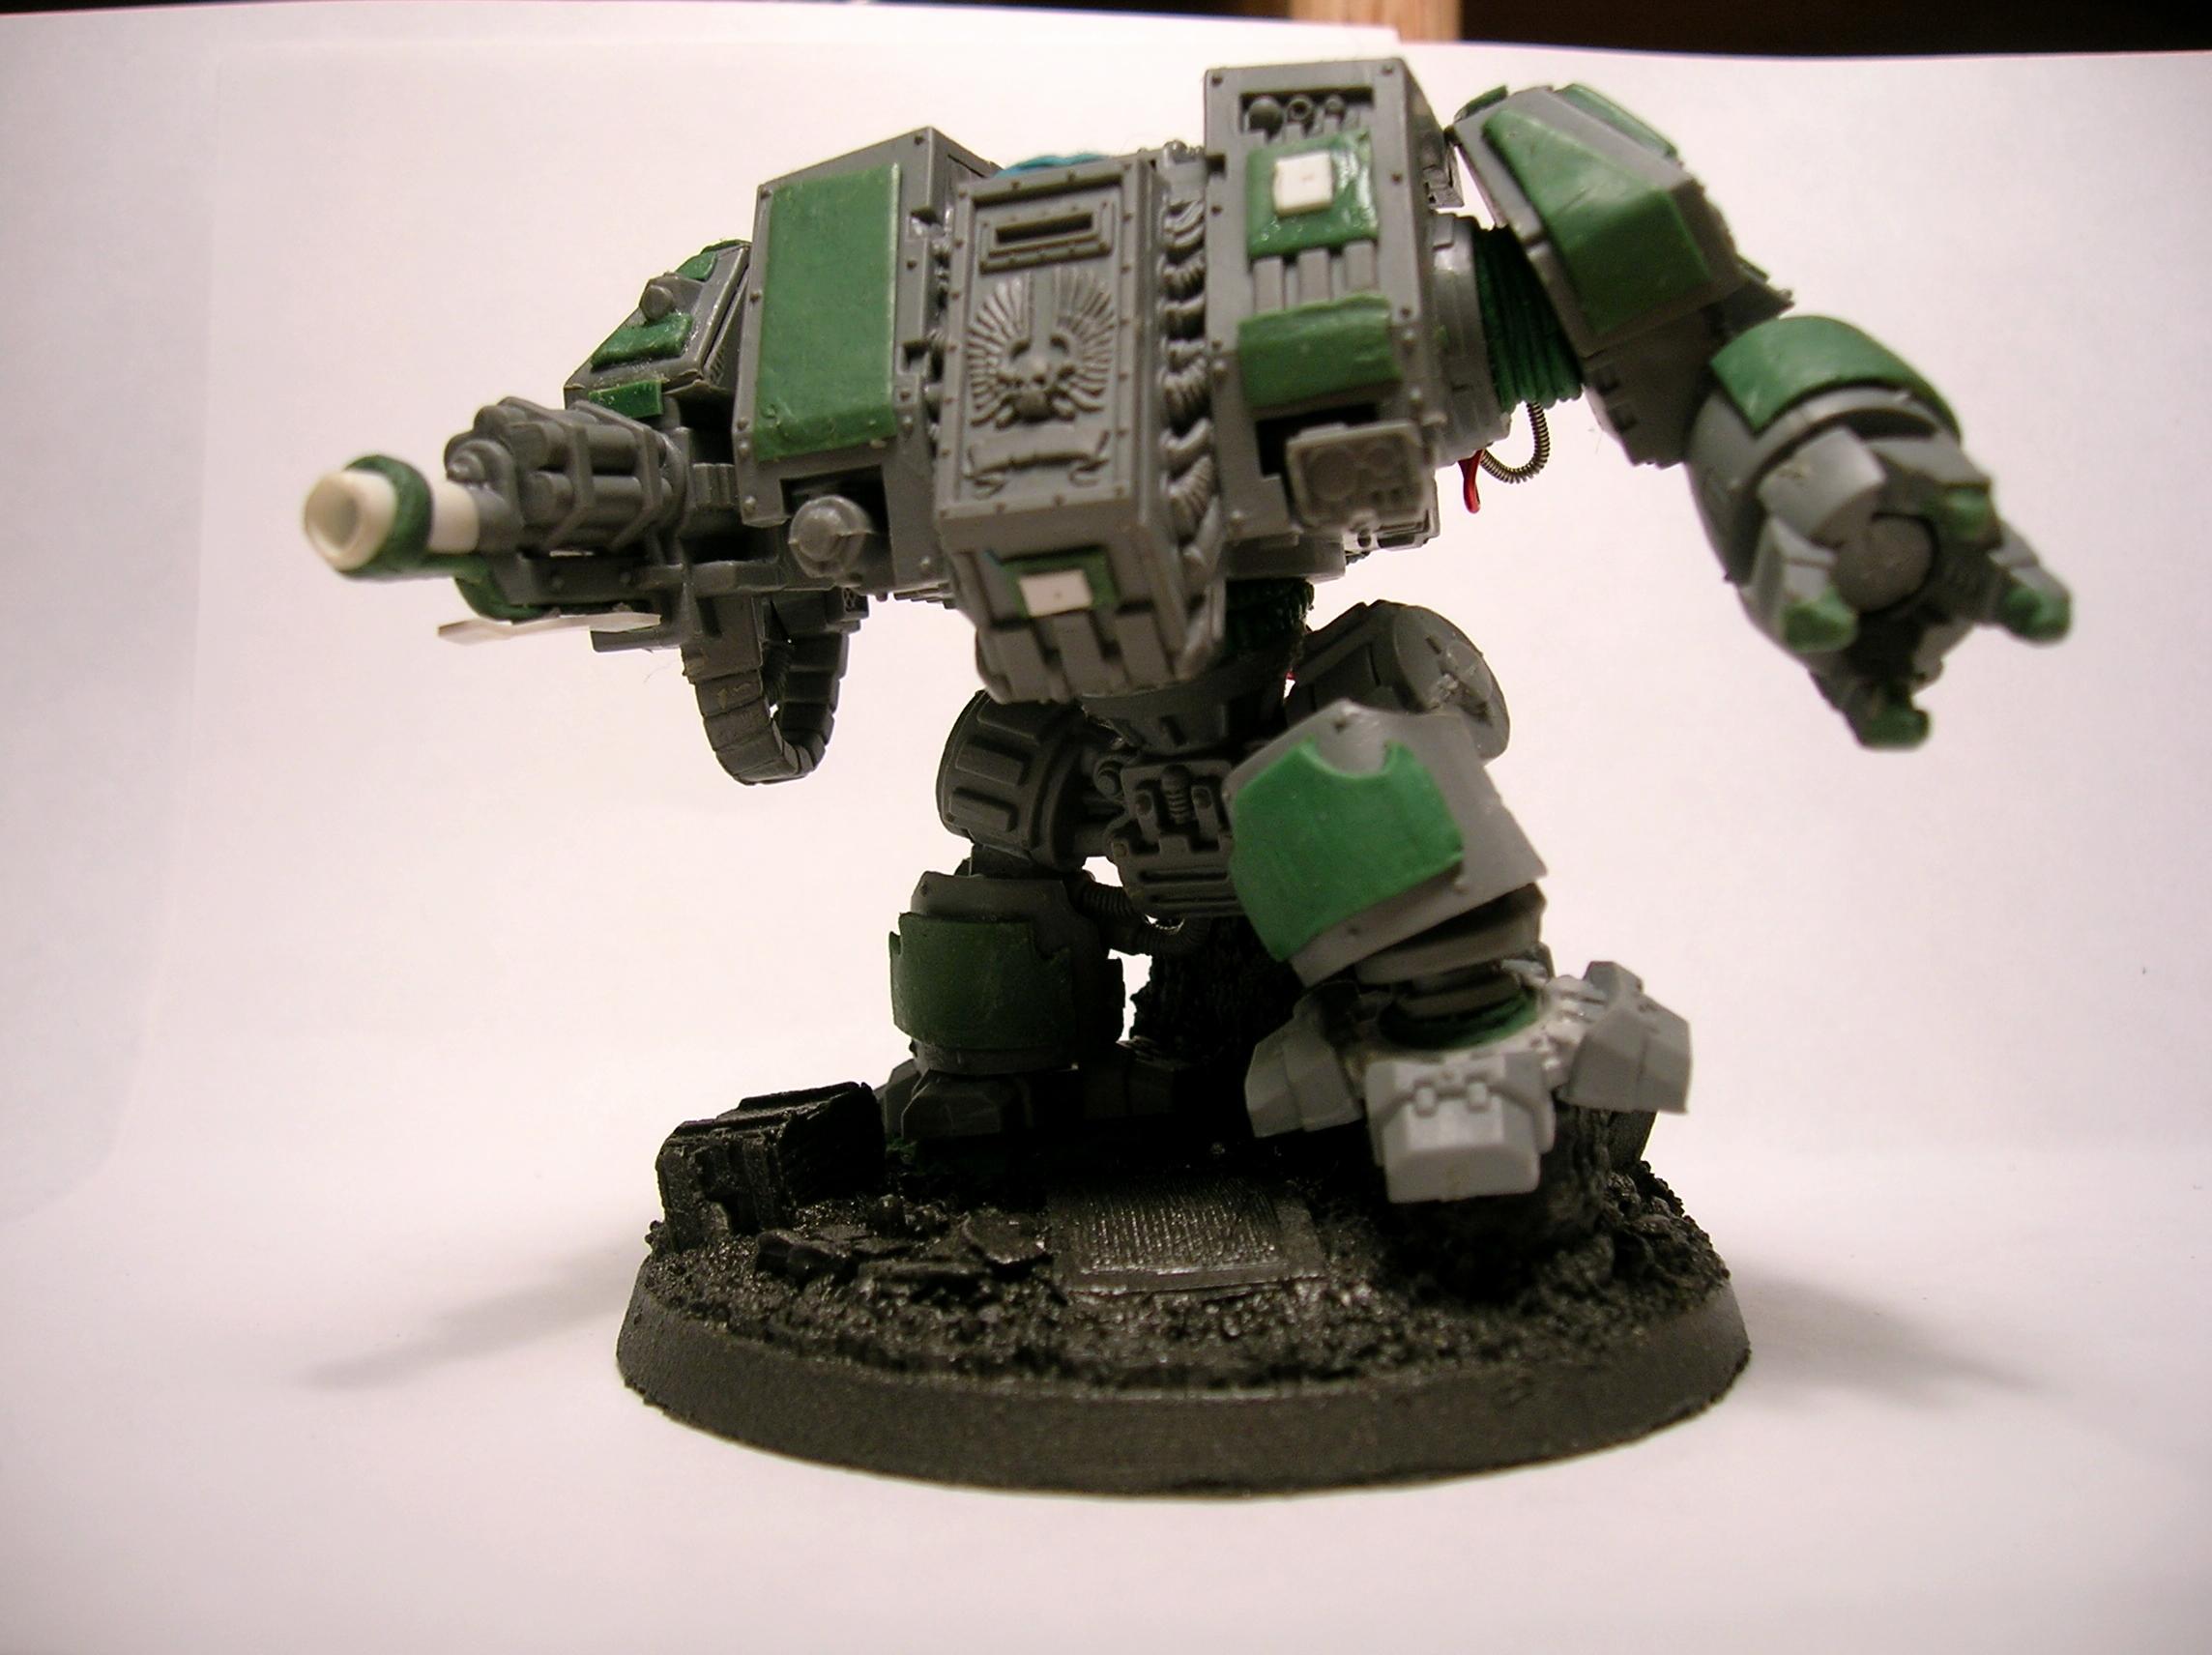 Dreadnaut, Dreadnought, Space Marines, Warhammer 40,000